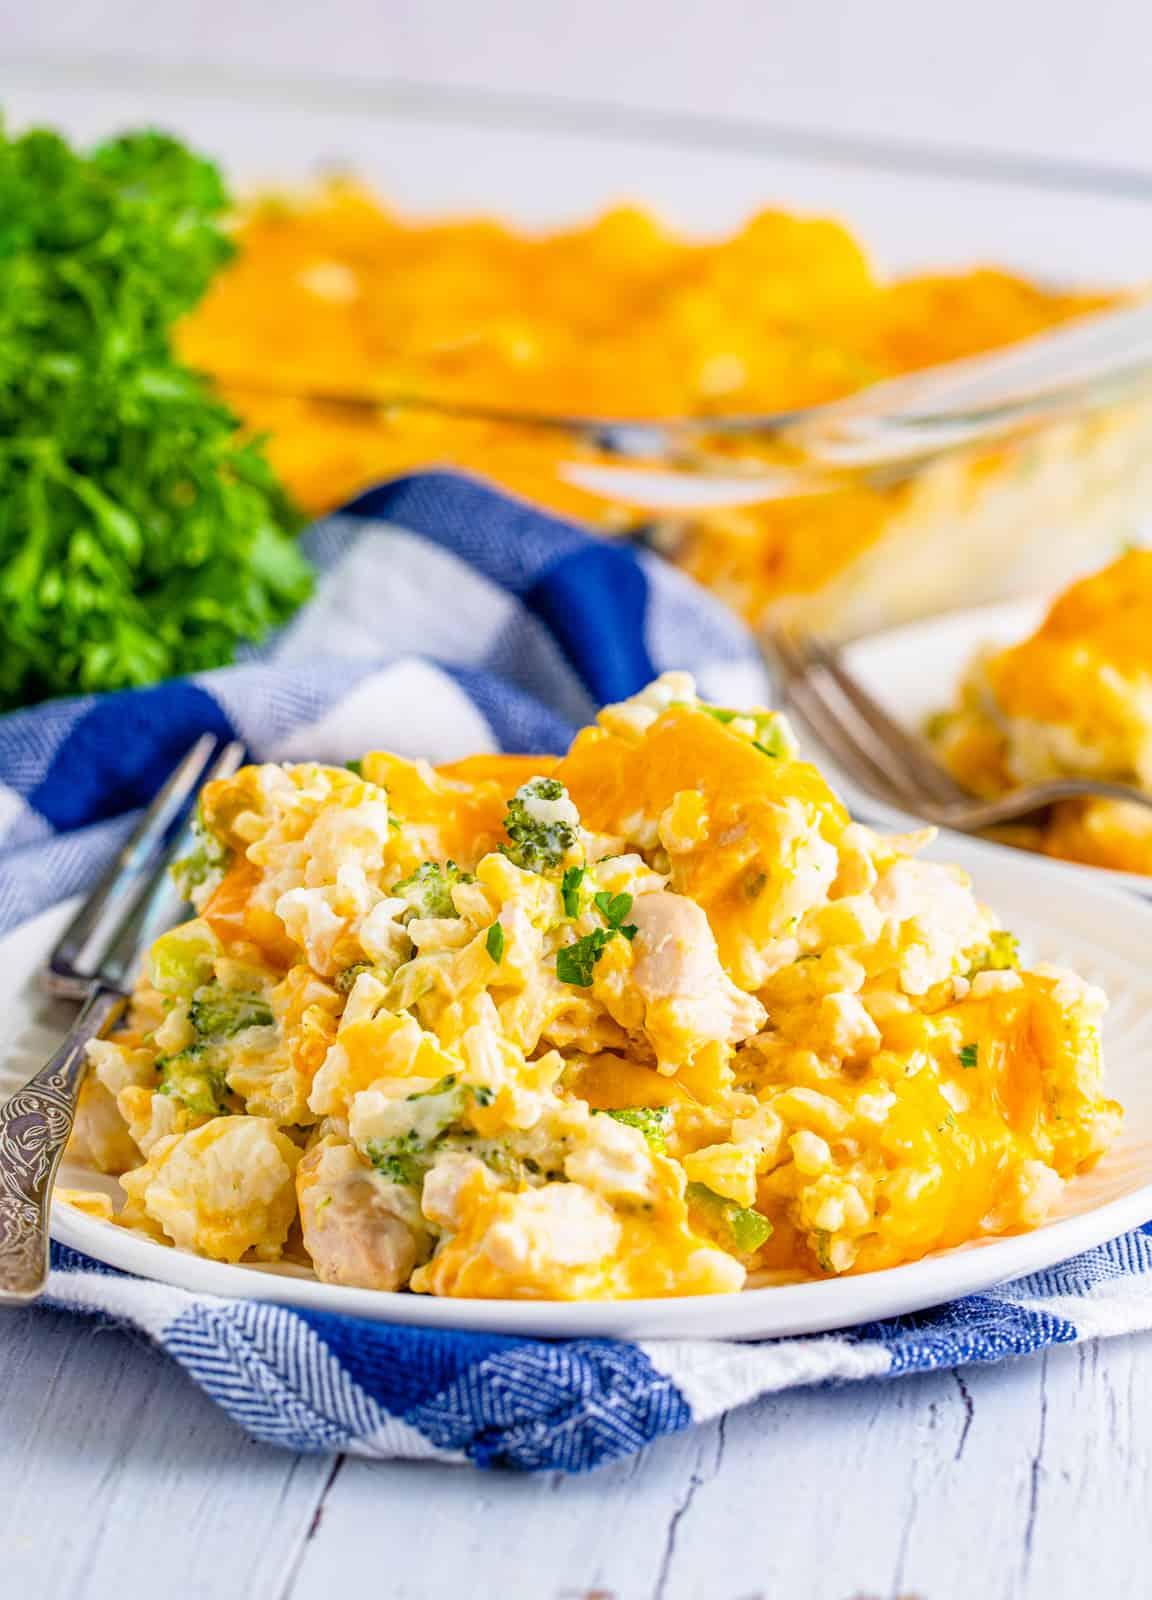 Plate of Chicken Broccoli Rice Casserole.